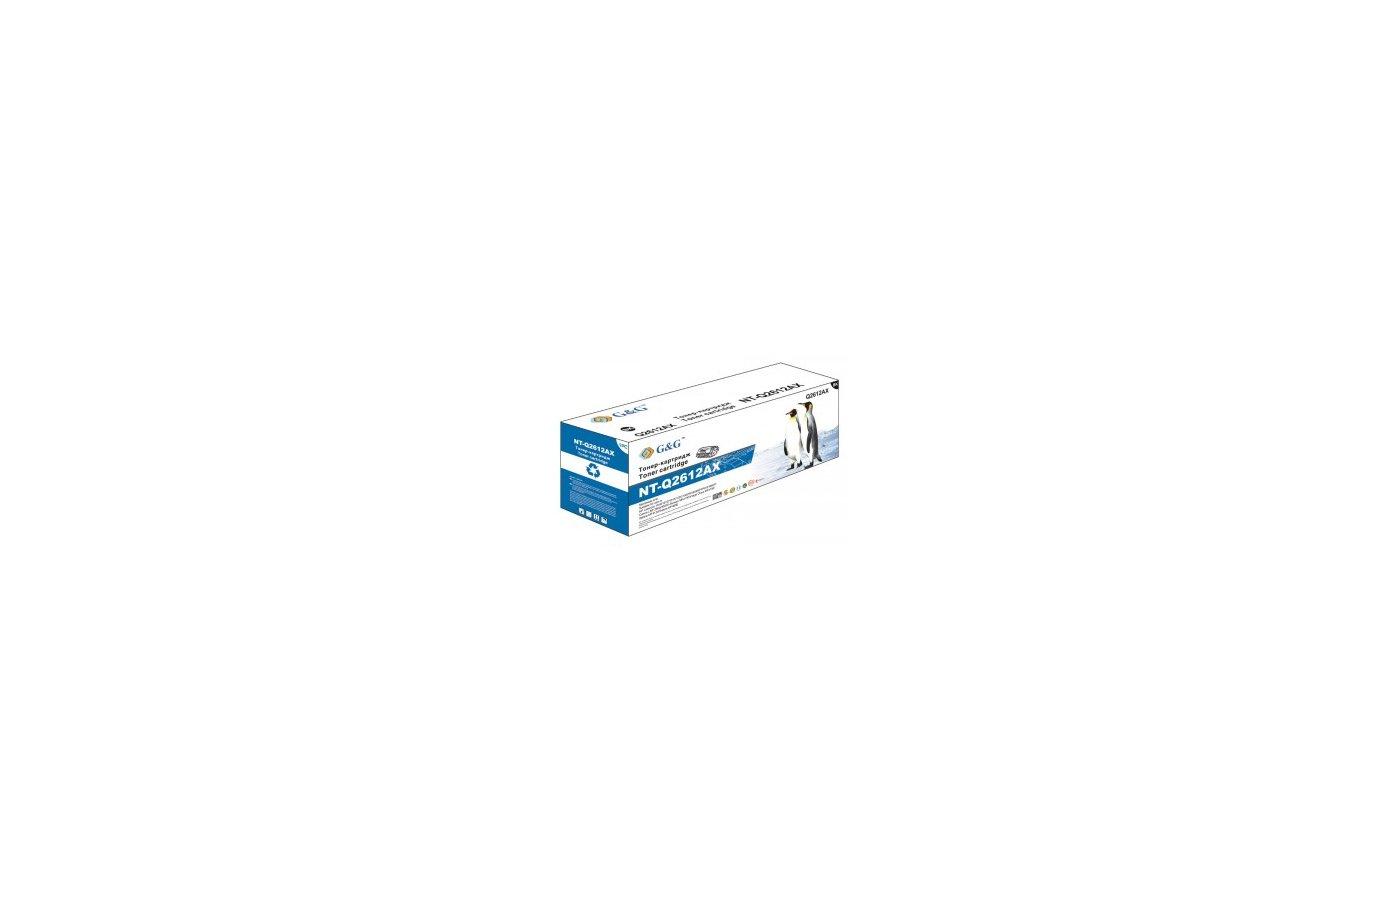 Картридж лазерный GG NT-Q2612AX Совместимый для HP LaserJet 1020/1022/3015/3020/3030 M1005/1319 (3000стр)